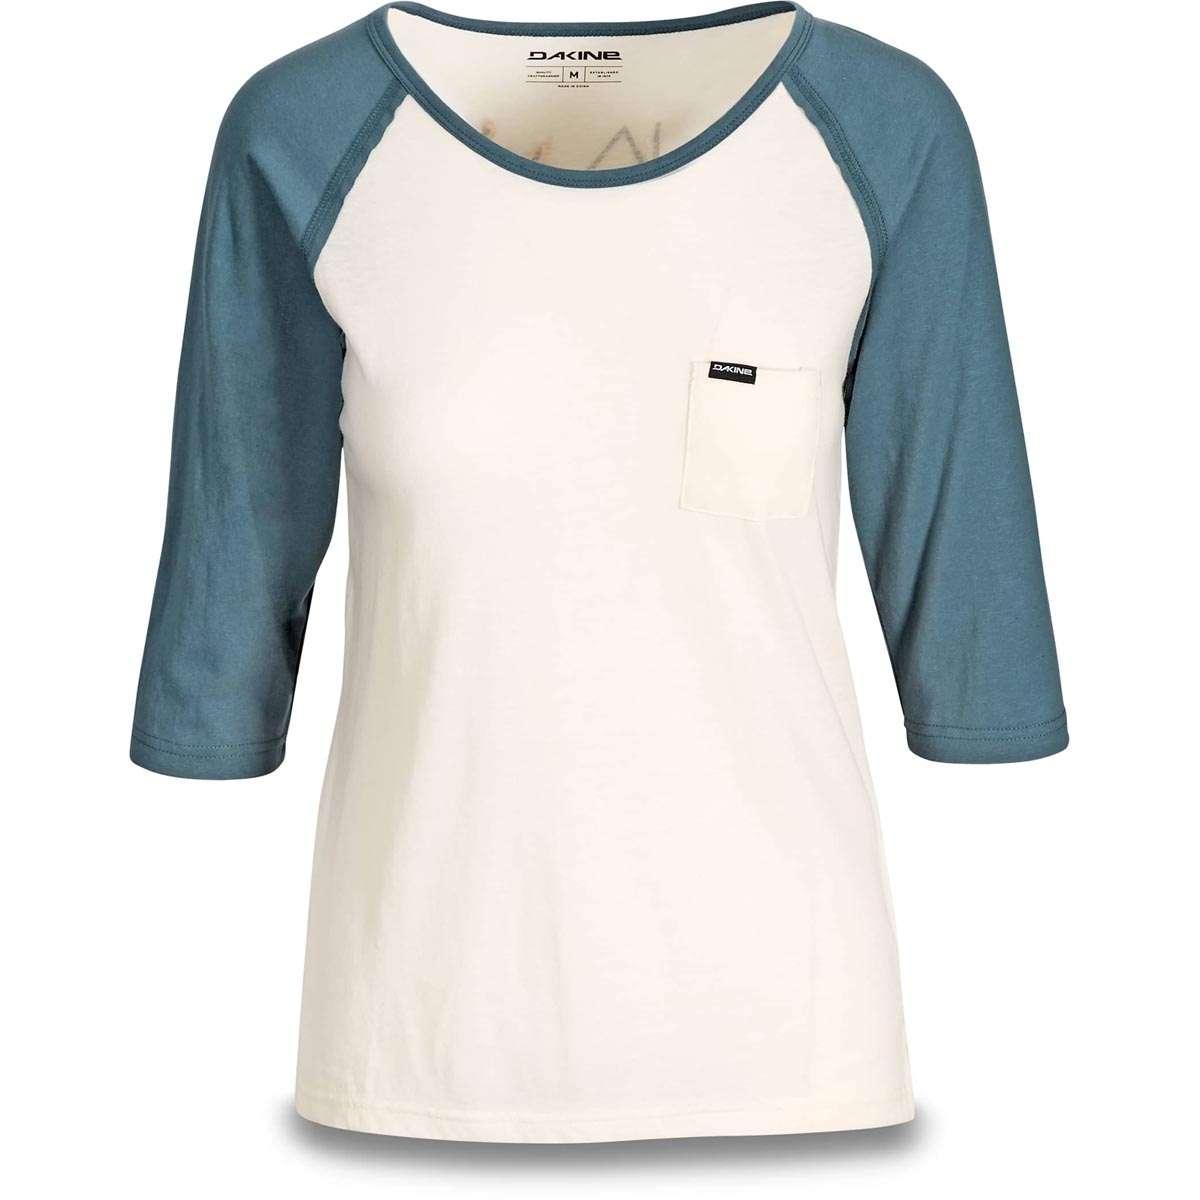 76ee7d5f524dbb Dakine Rikki 3/4 Baseball Tee Damen T-Shirt Stargazer | Dakine Shop